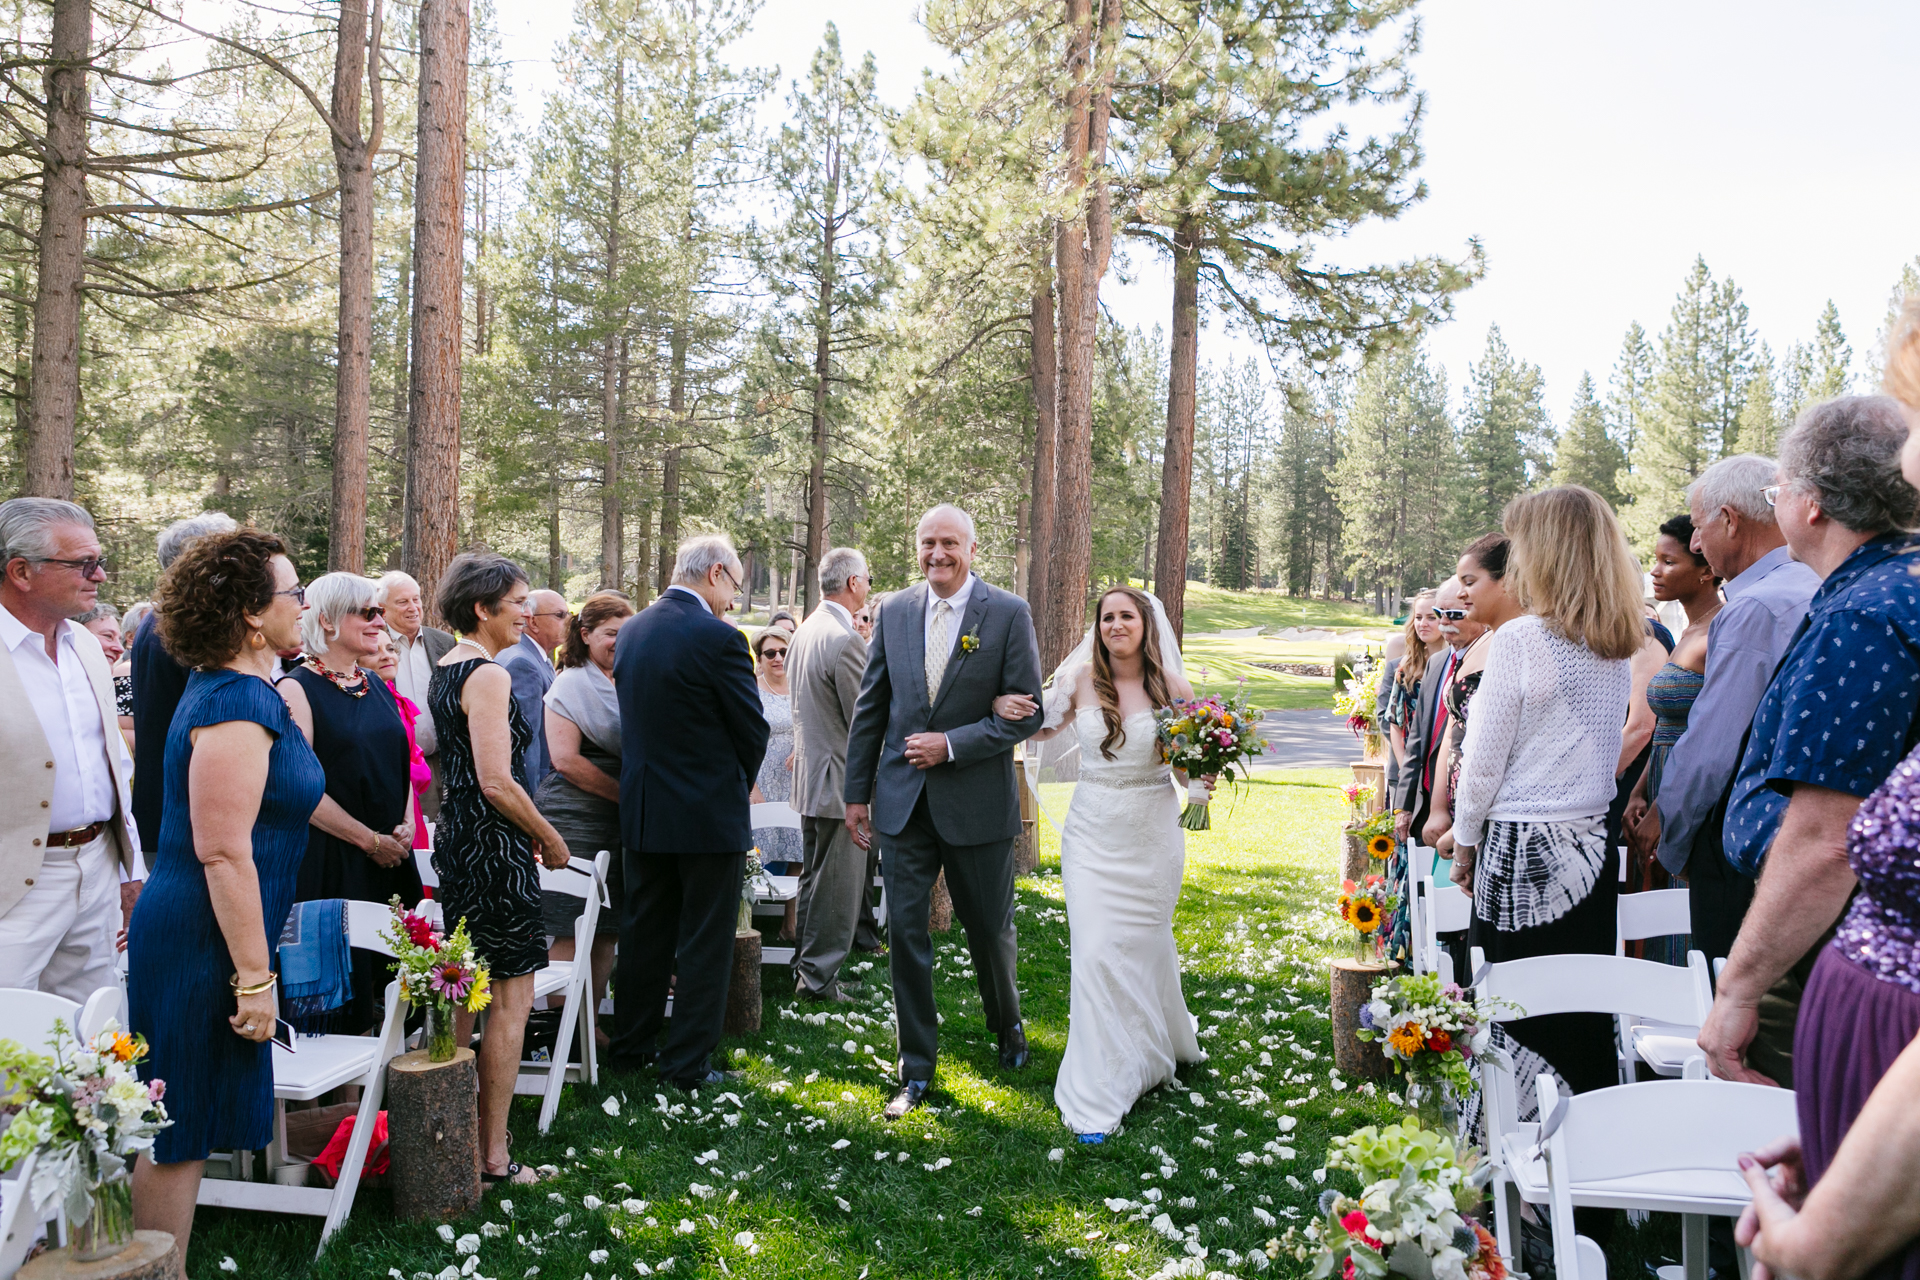 AnneDaniel_WeddingPreview_B3_4232-2.jpg